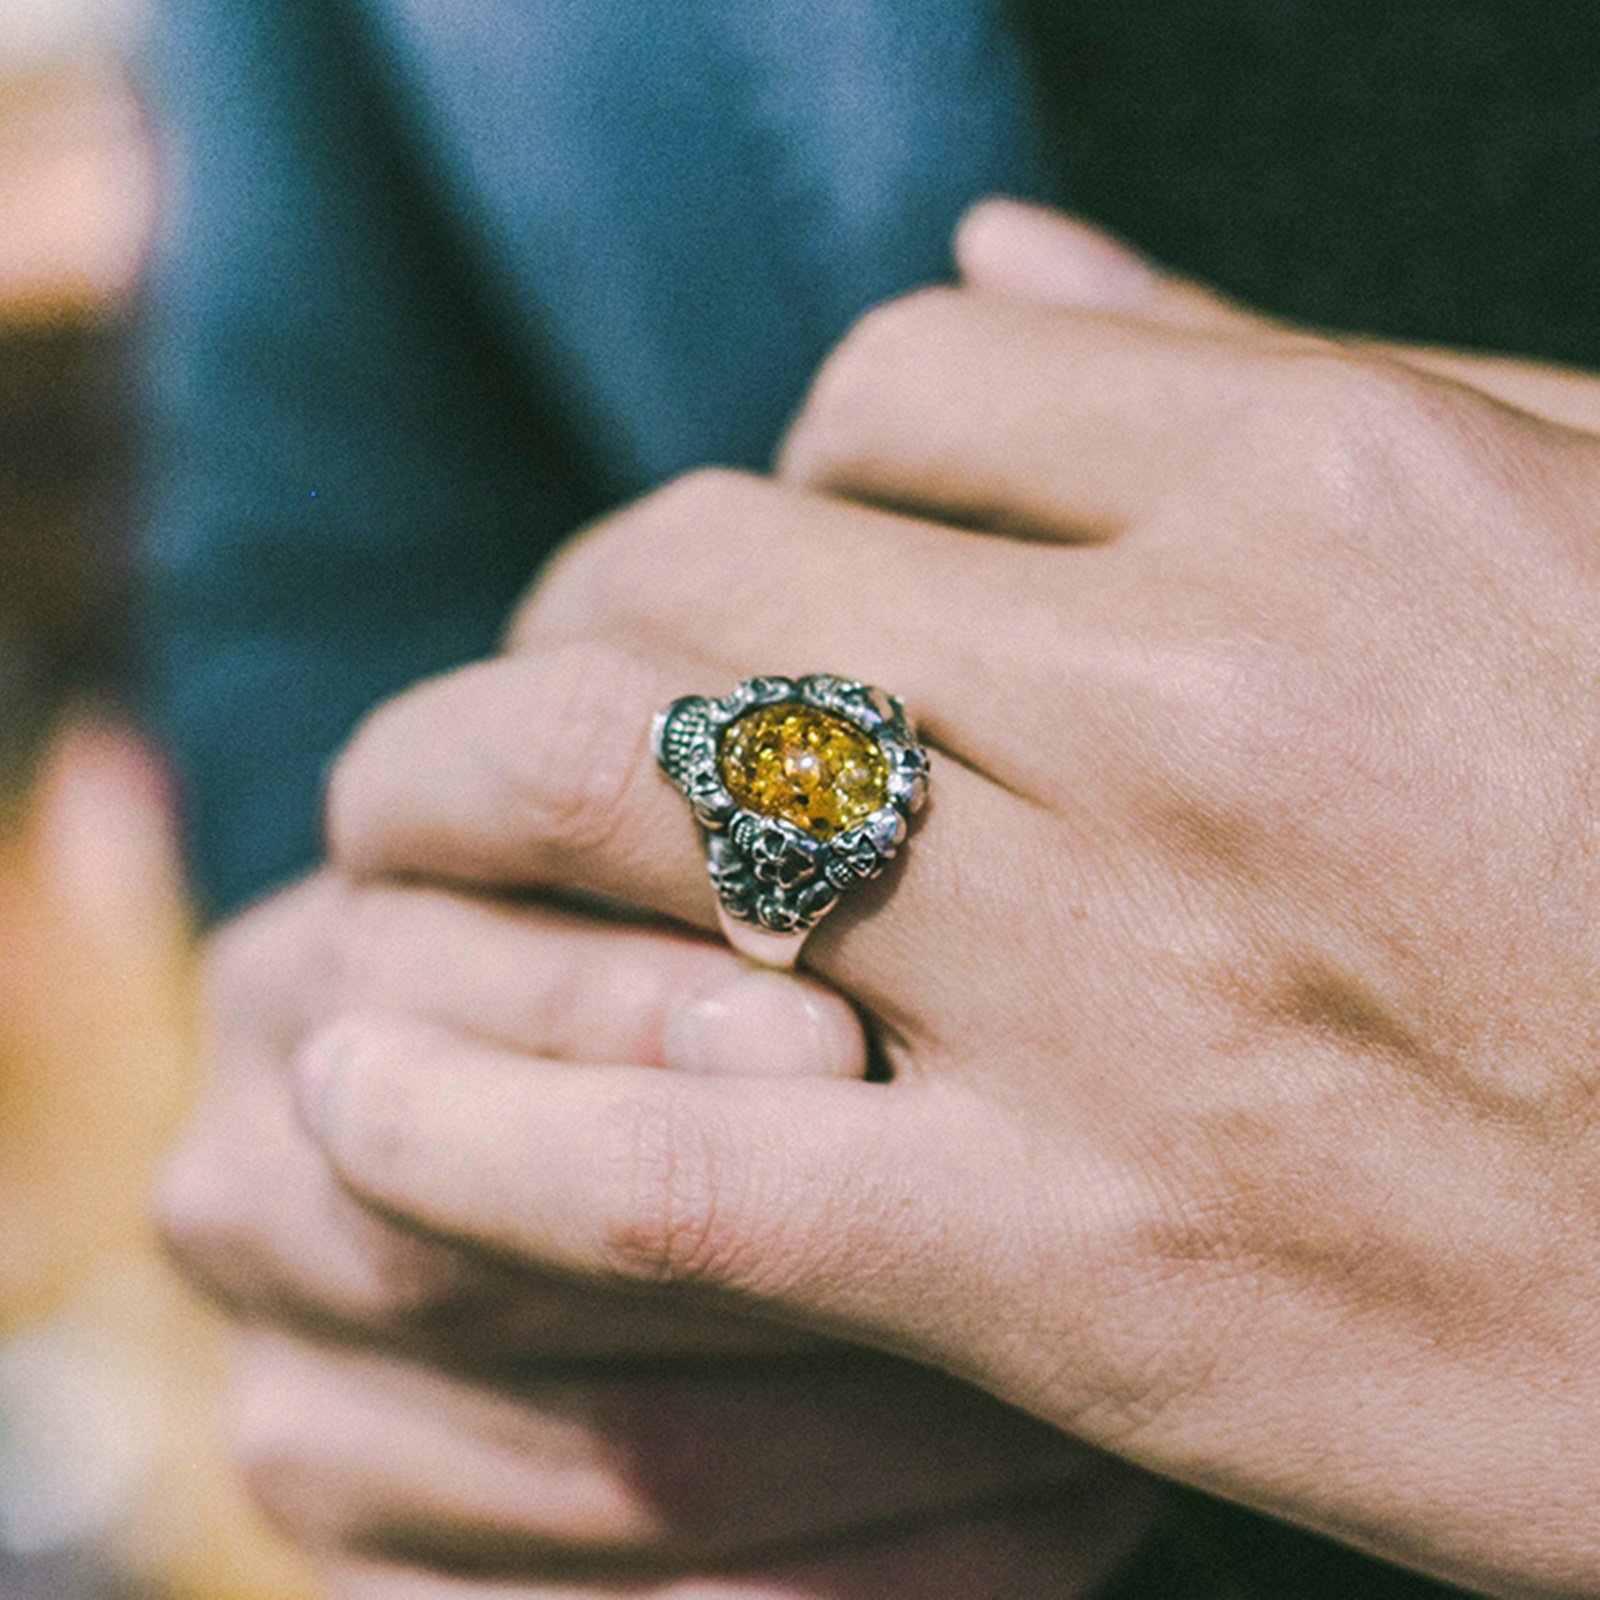 Adisaer Biker Rings Silver Ring for Men Skull Amber Ring Size 10.5 Vintage Punk Jewelry by Adisaer (Image #2)